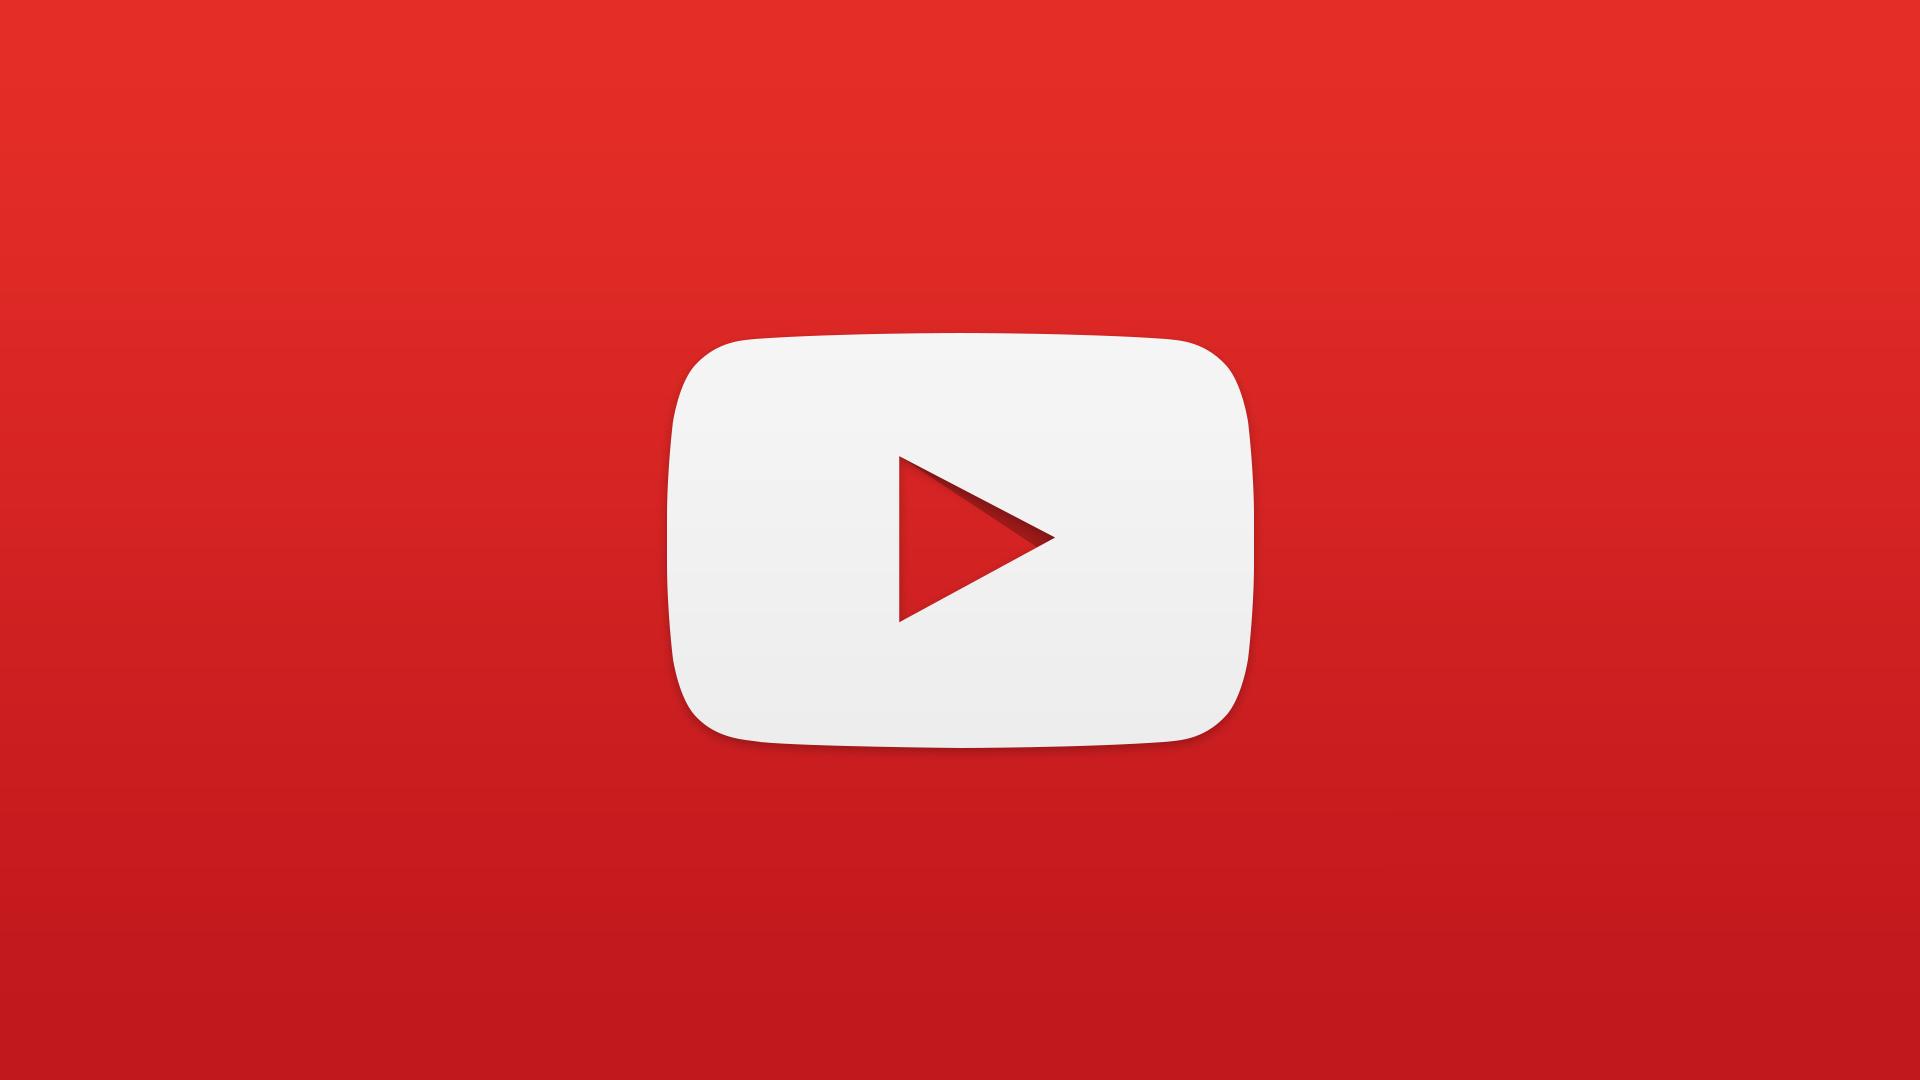 Youtube-Wallpaper-Iphone